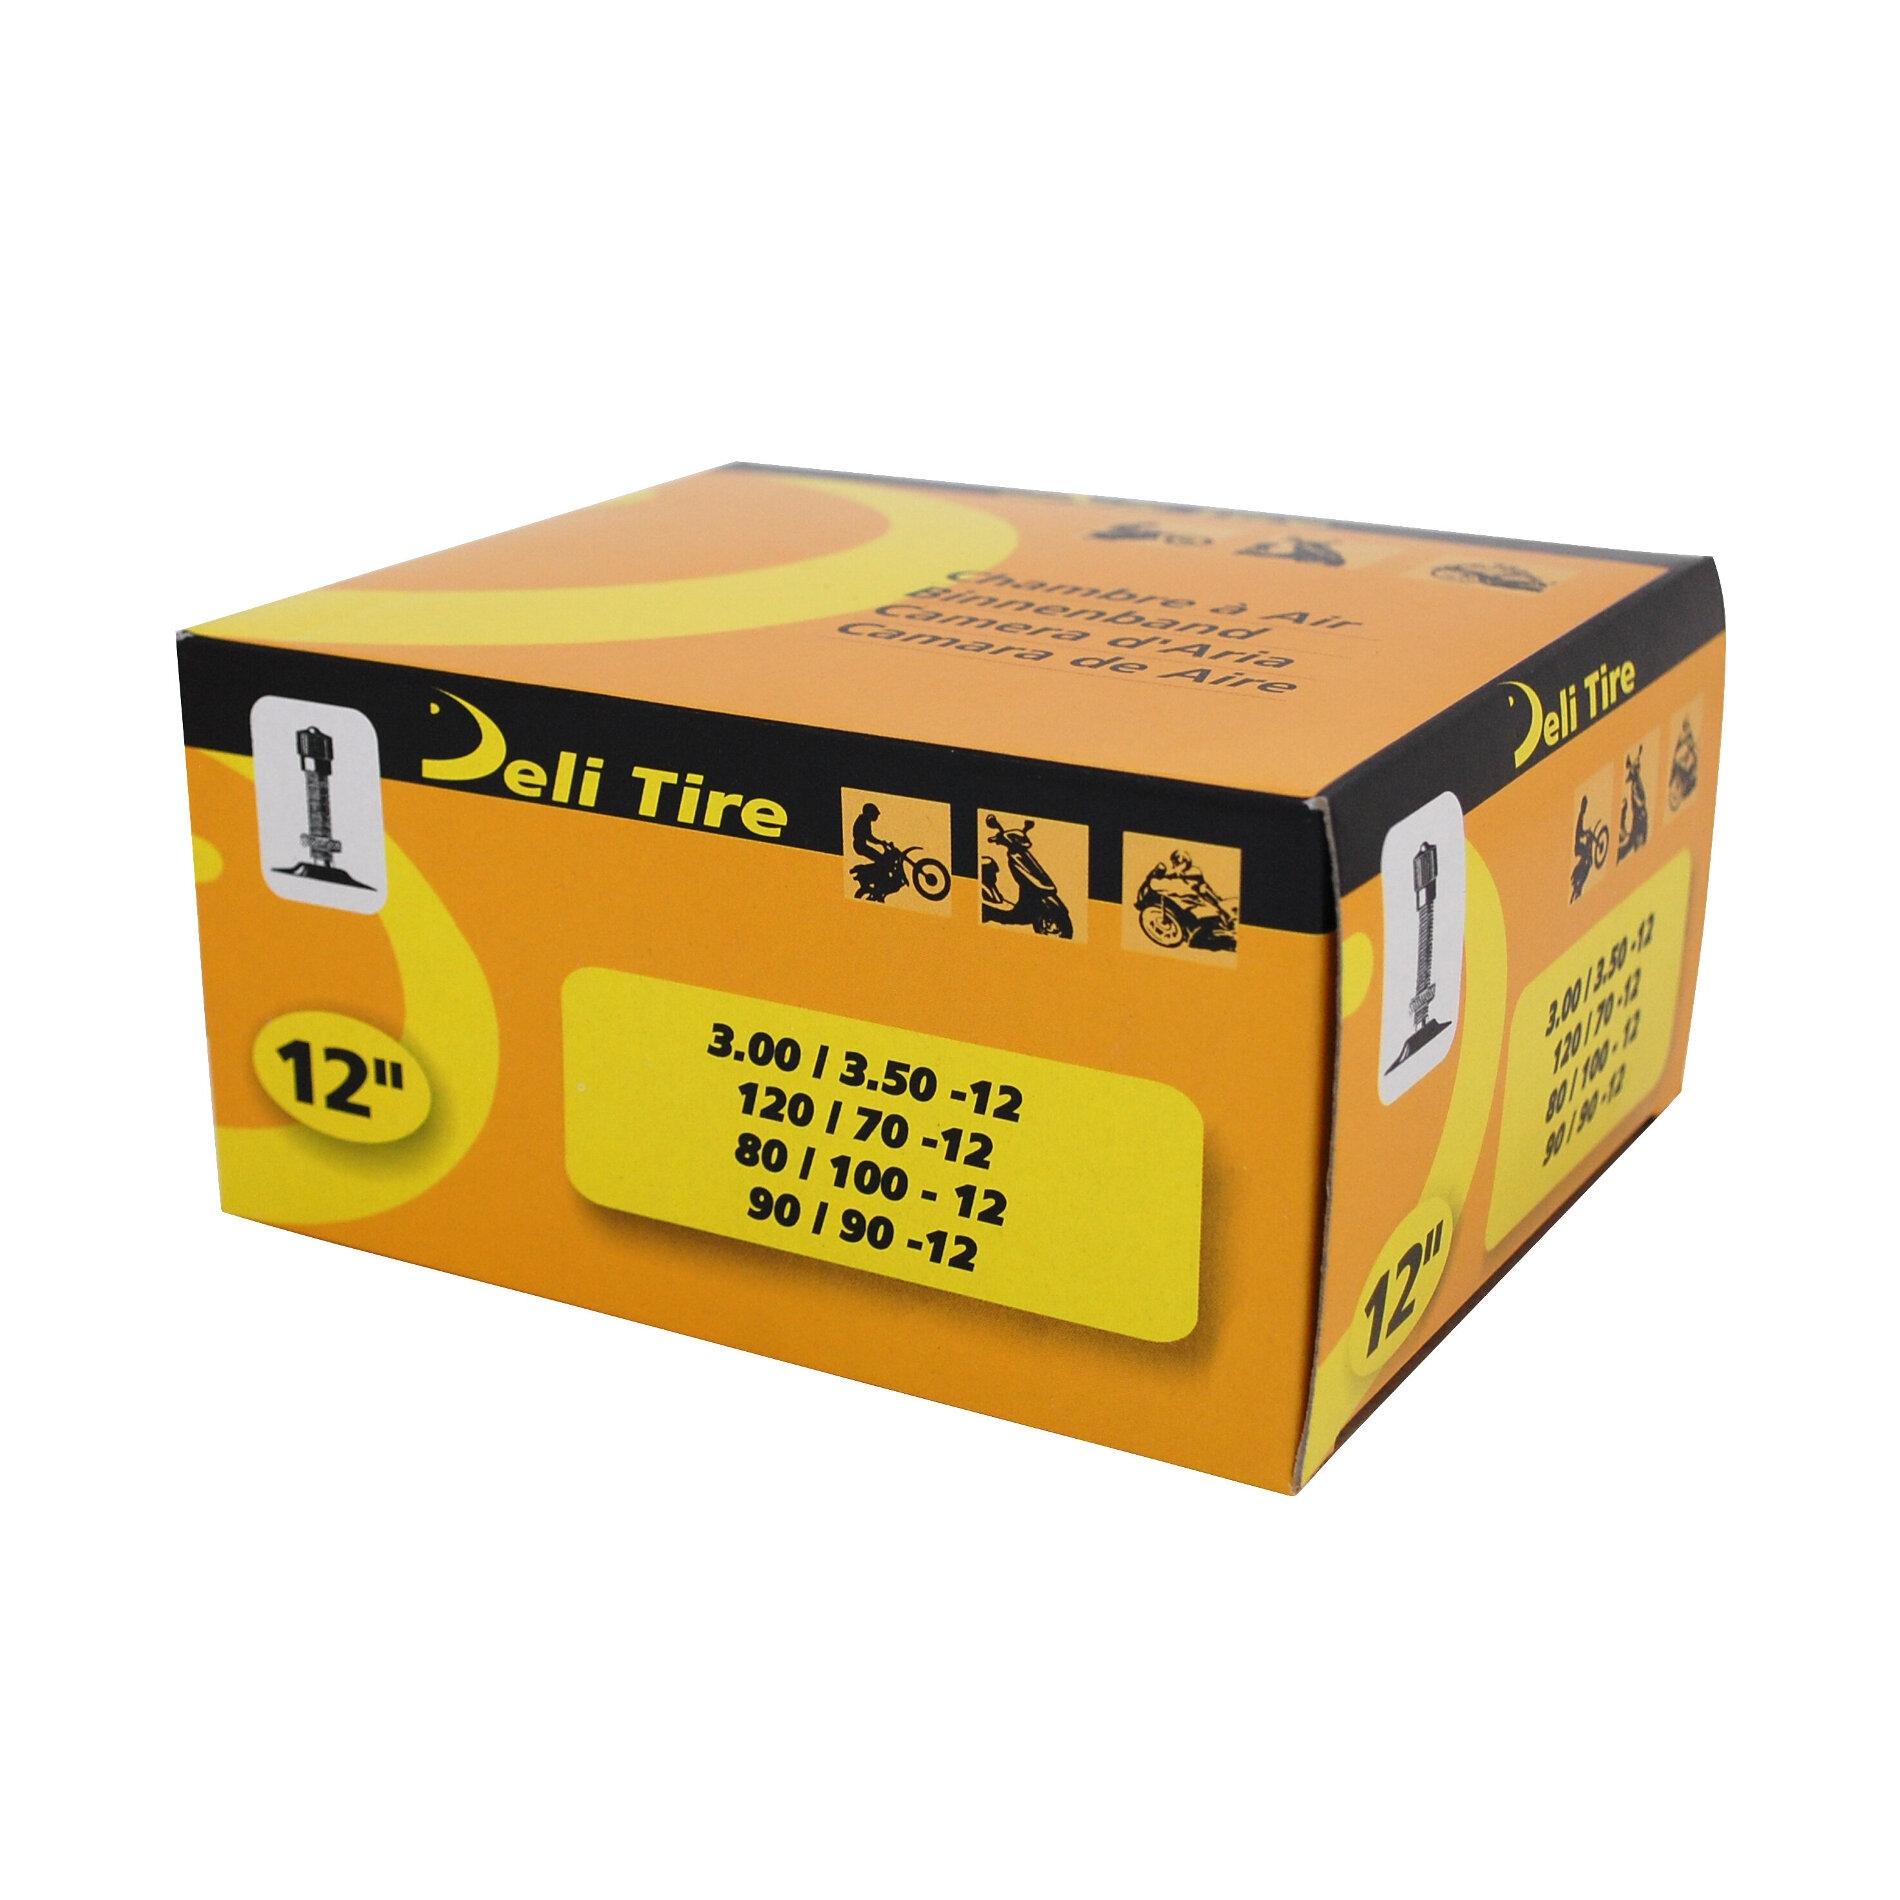 Chambre à Air 12 (DIRT) 3.00/3.50x12 Deli valve Droite